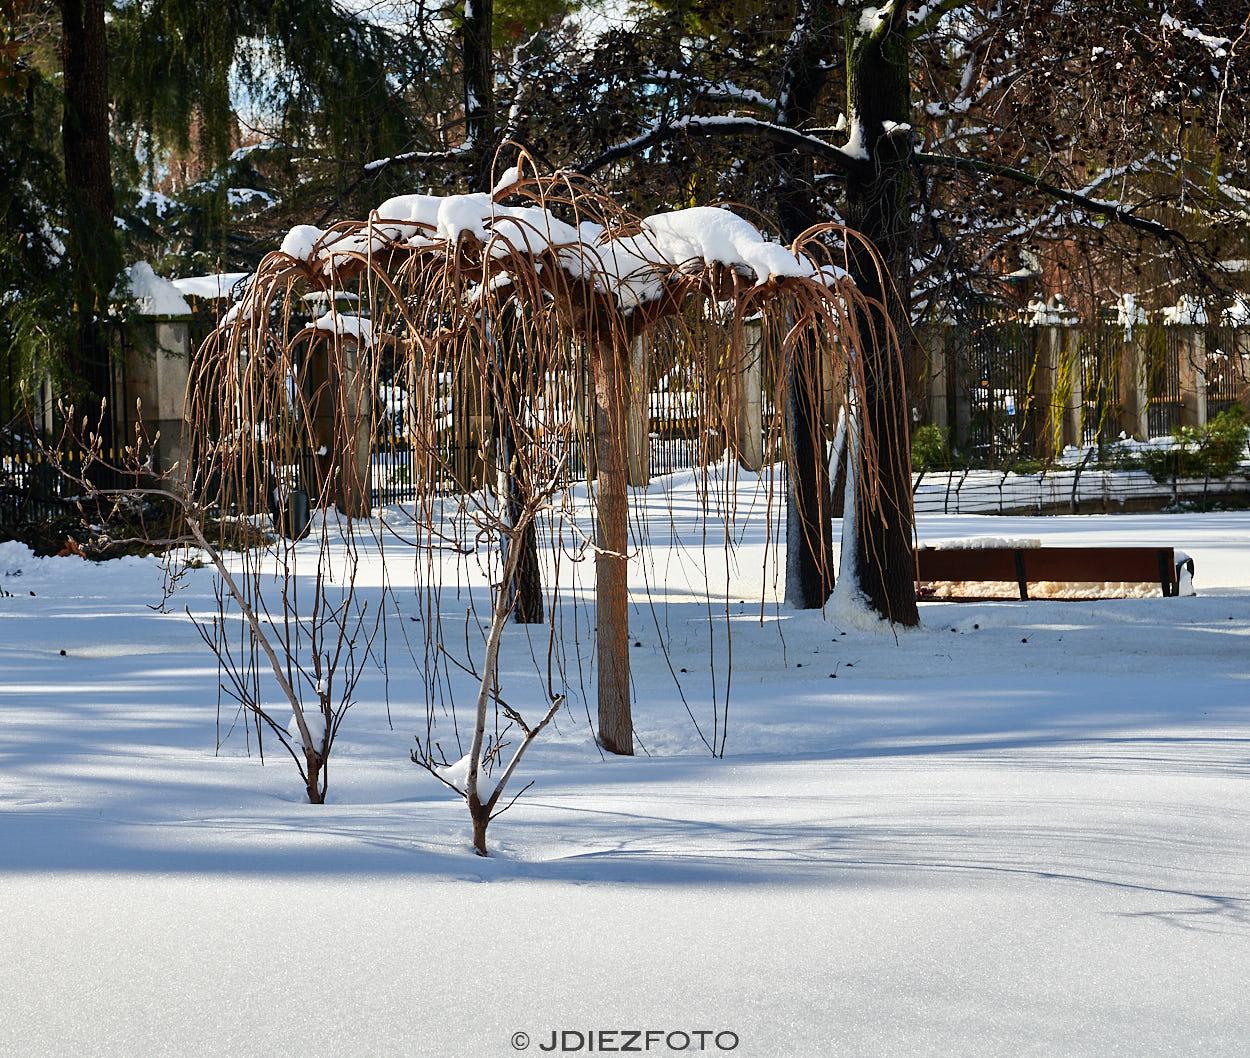 Filomena cubre de nieve el Parque del Retiro